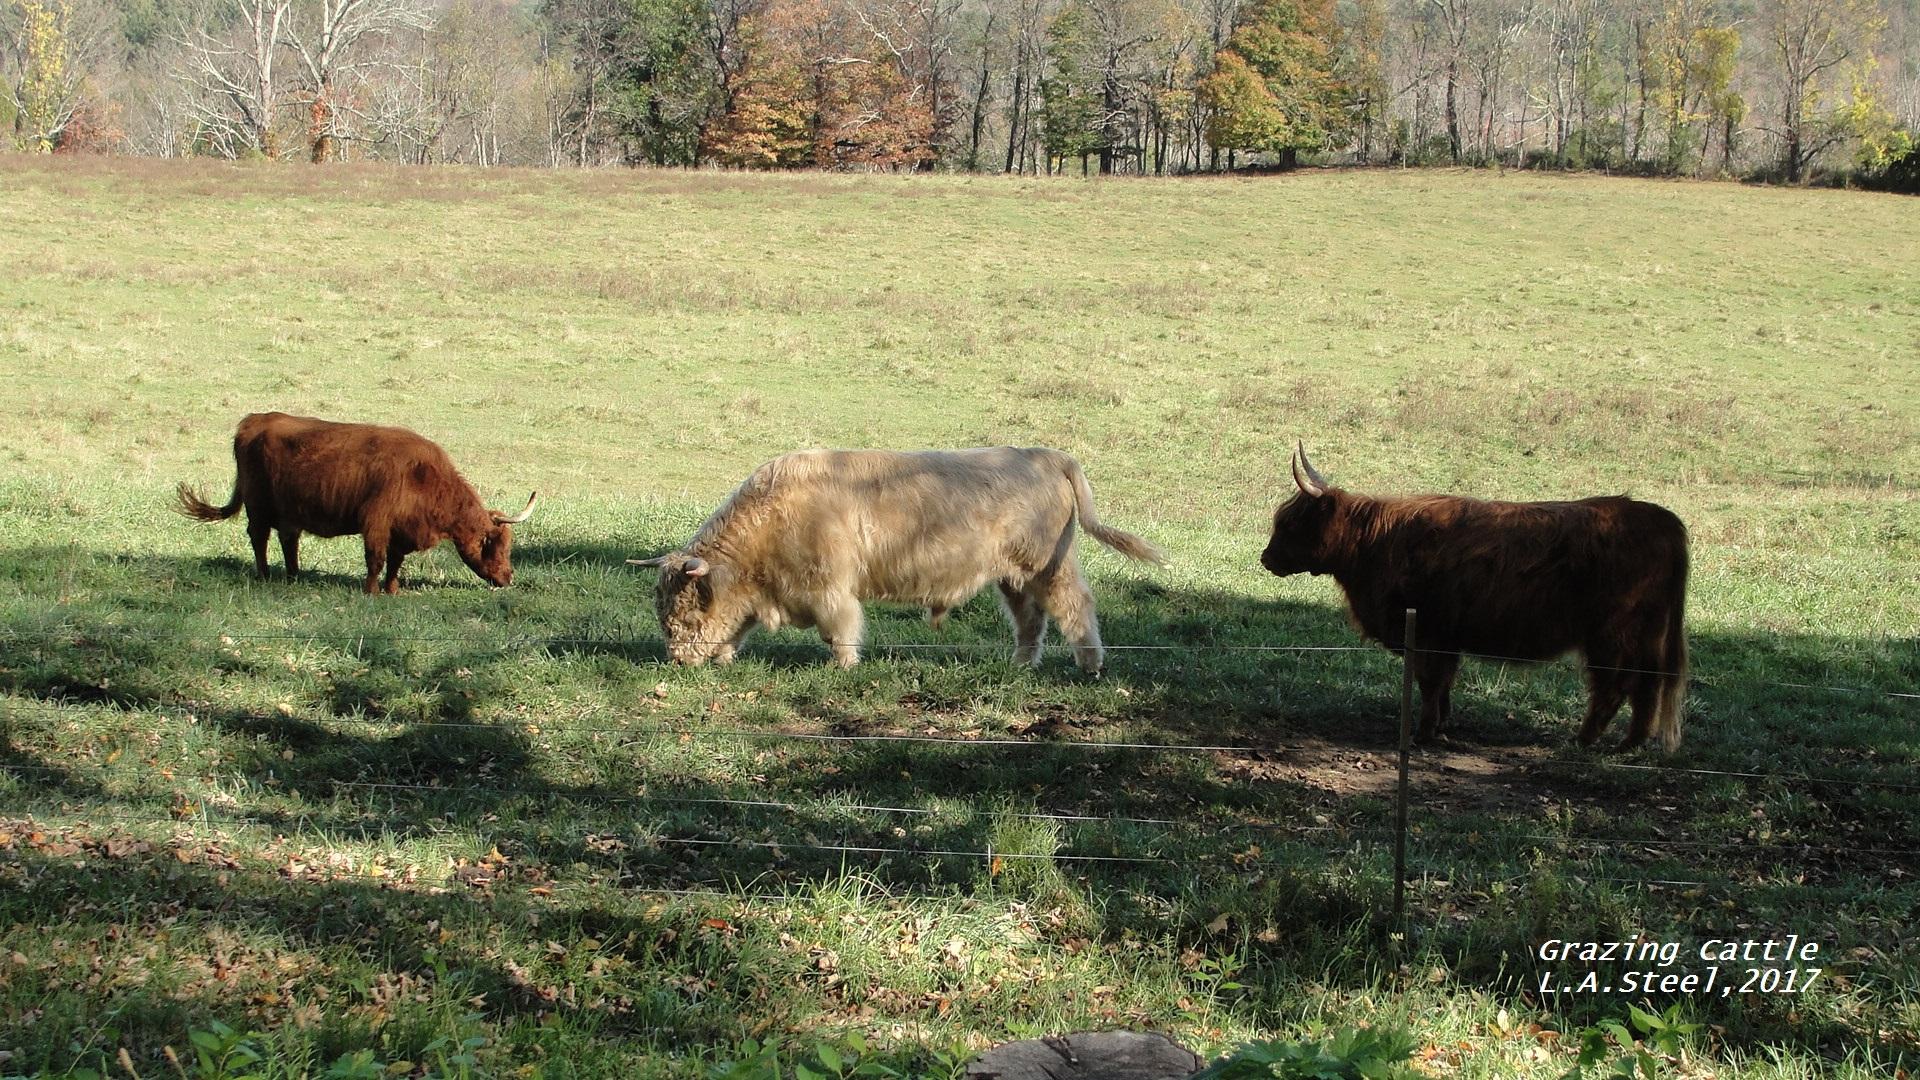 grazing cattle series 1 2017